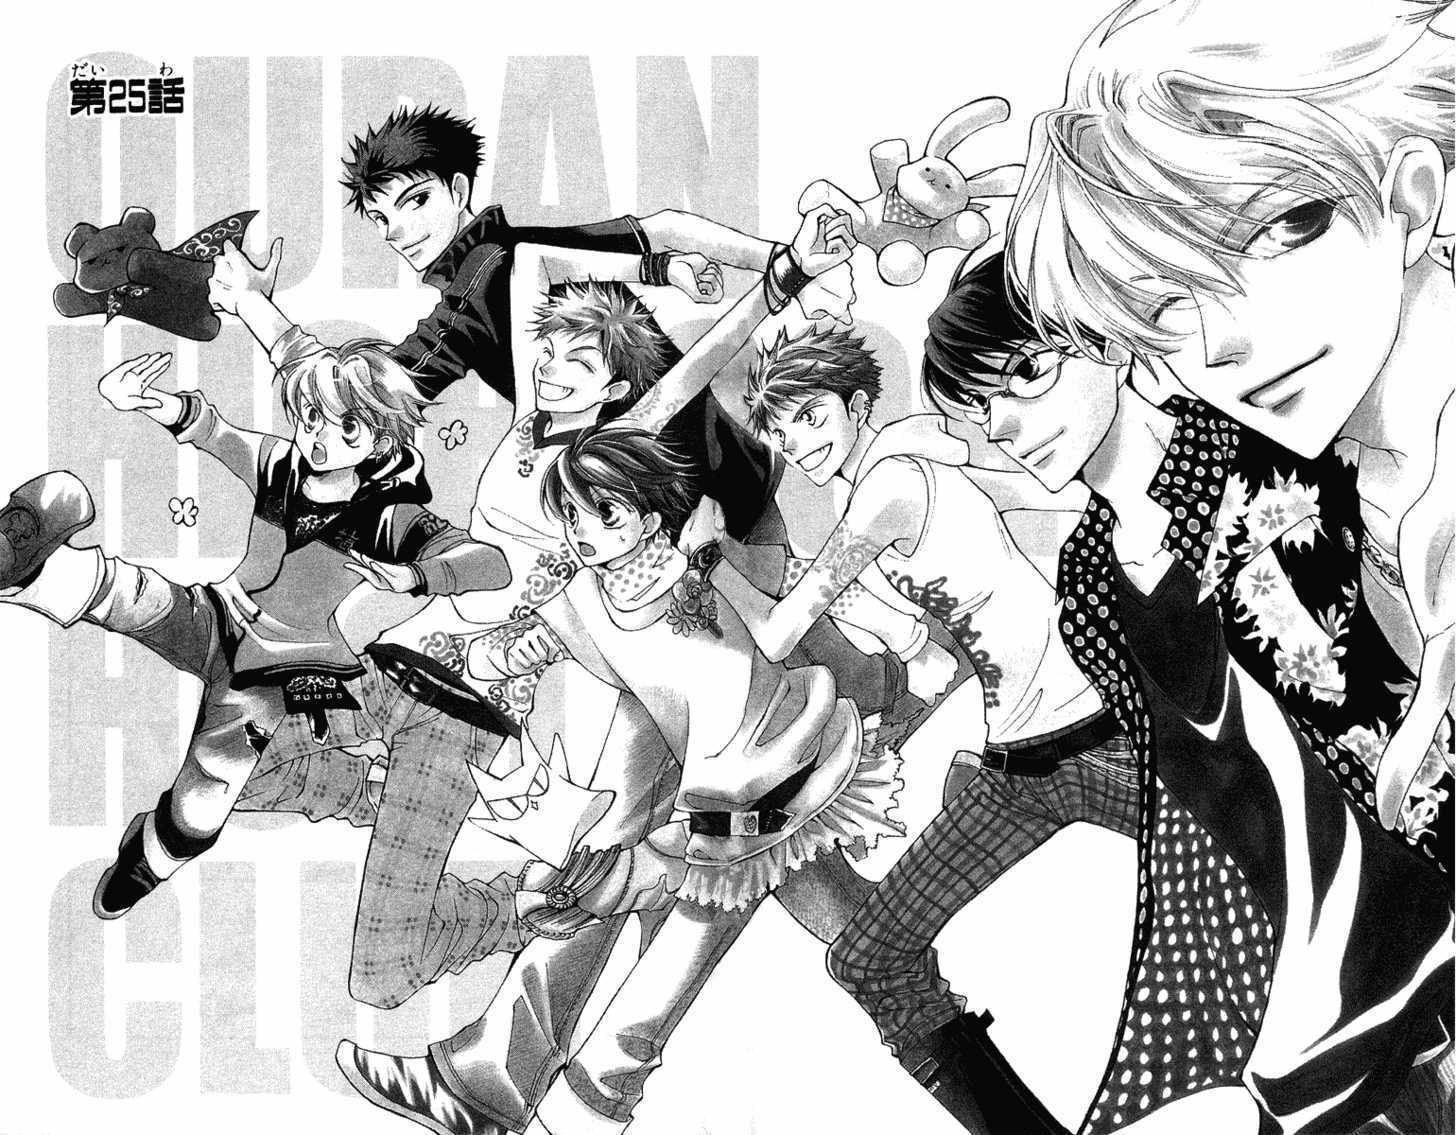 Ouran High School Host Club [Manga]: Cute and a lot of fun ...